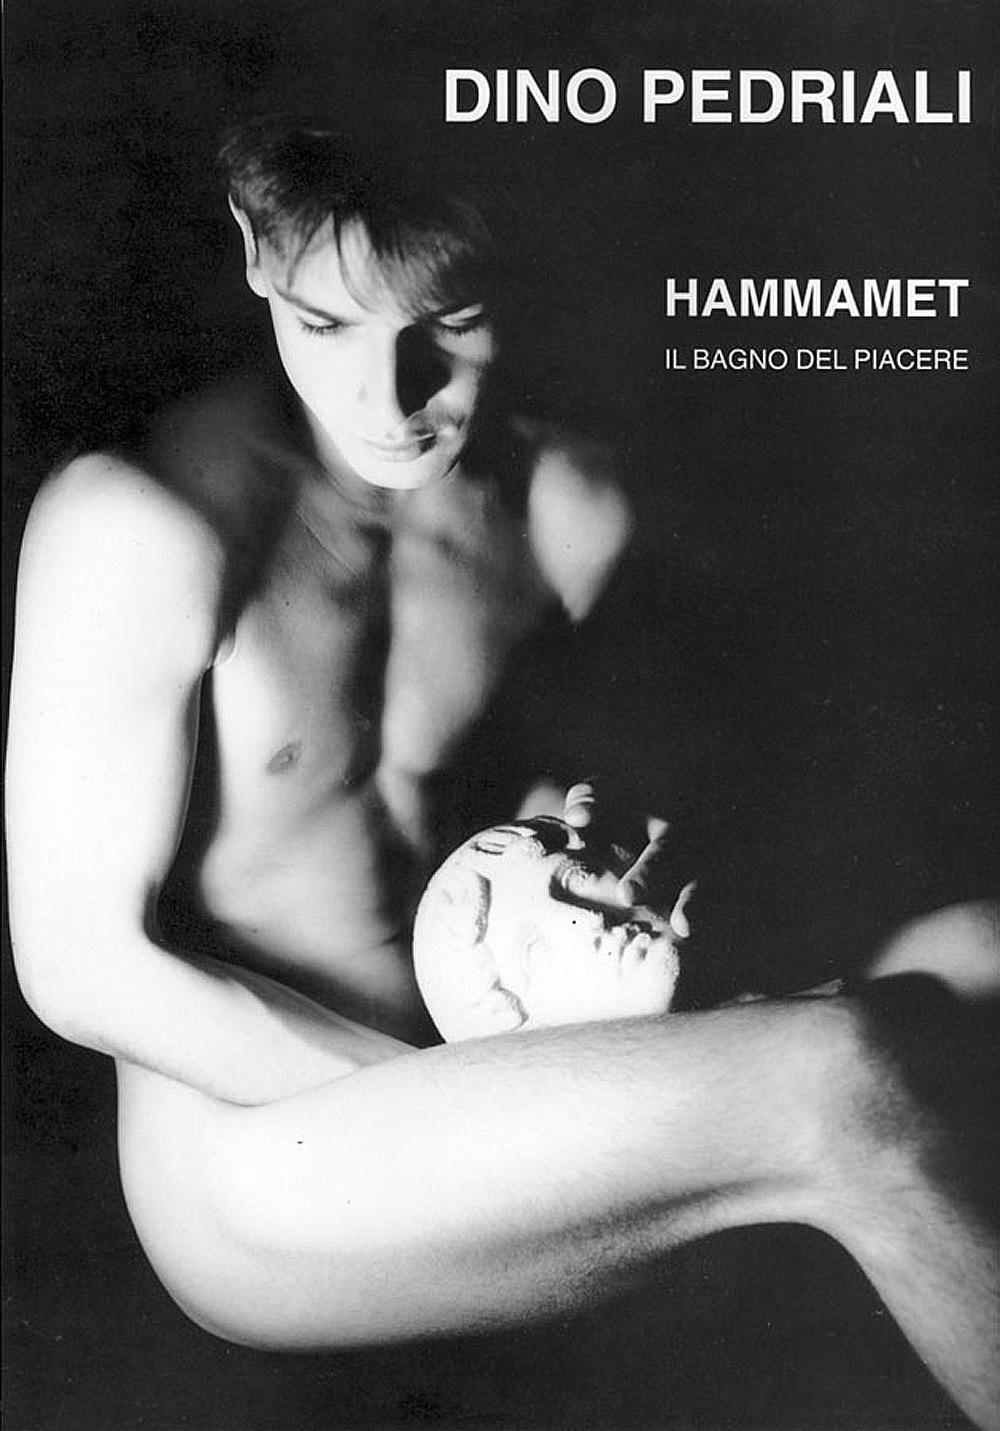 Hammamet. Il bagno del piacere